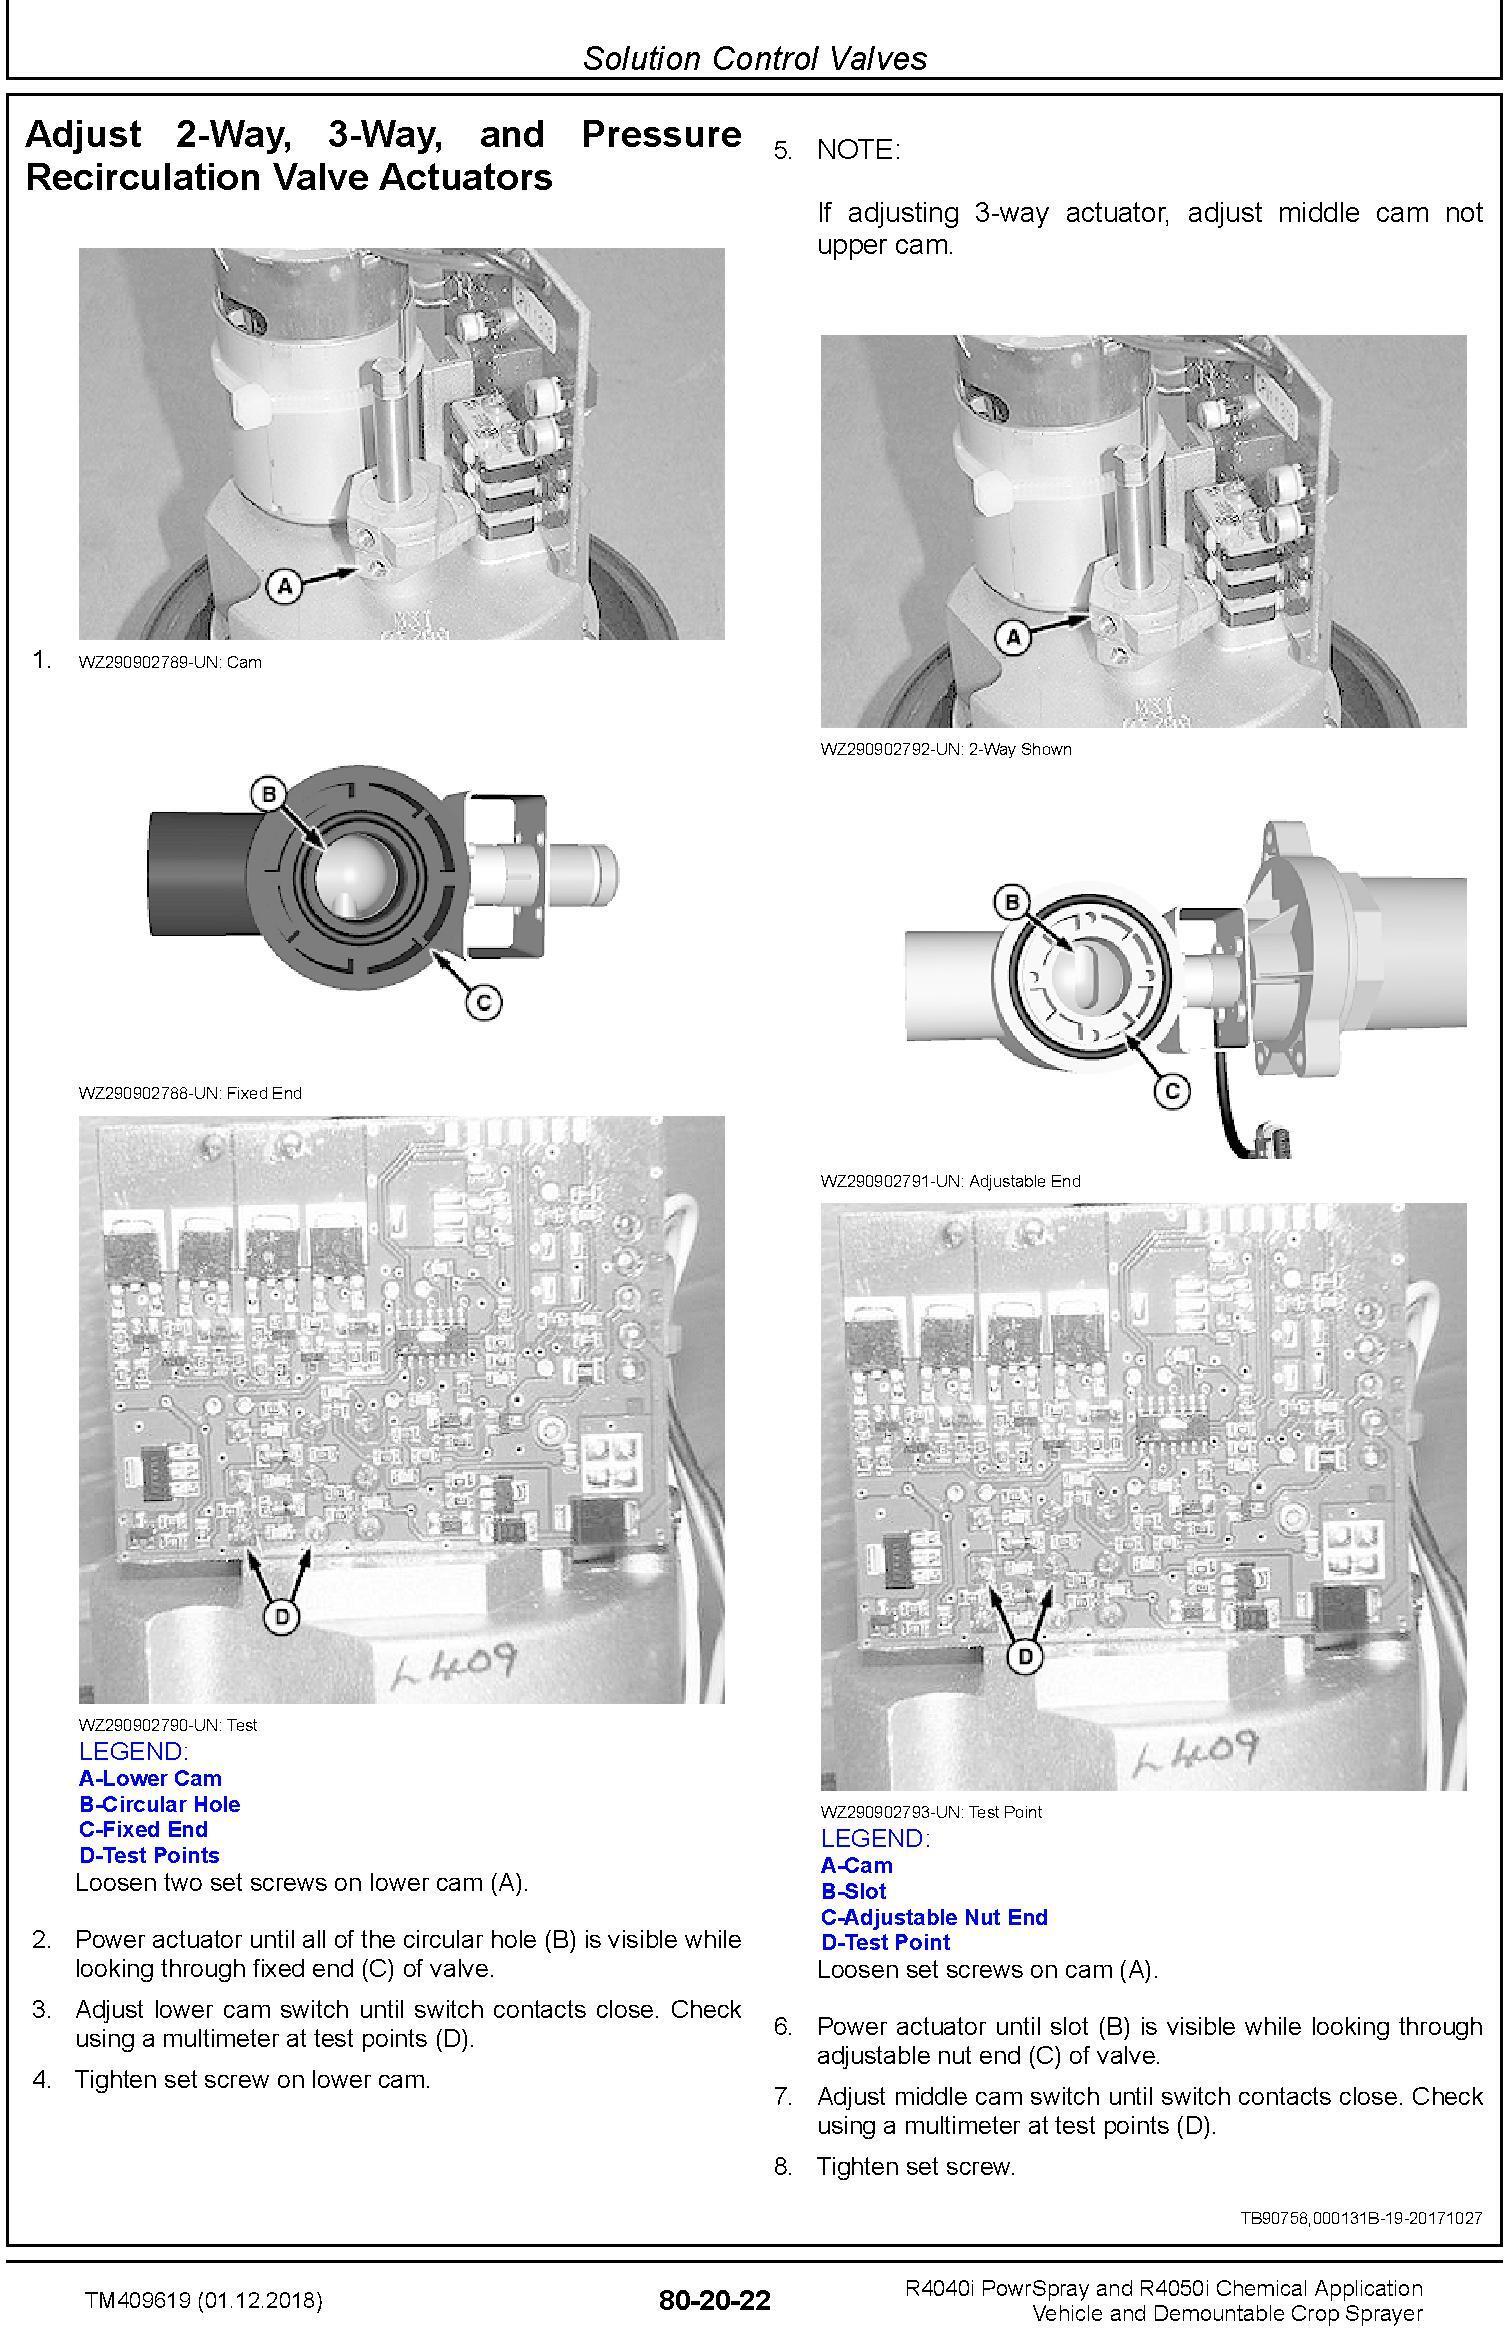 John Deere R4040i, R4050i Demountable Crop Sprayer (MY18) Repair Technical Service Manual (TM409619) - 1